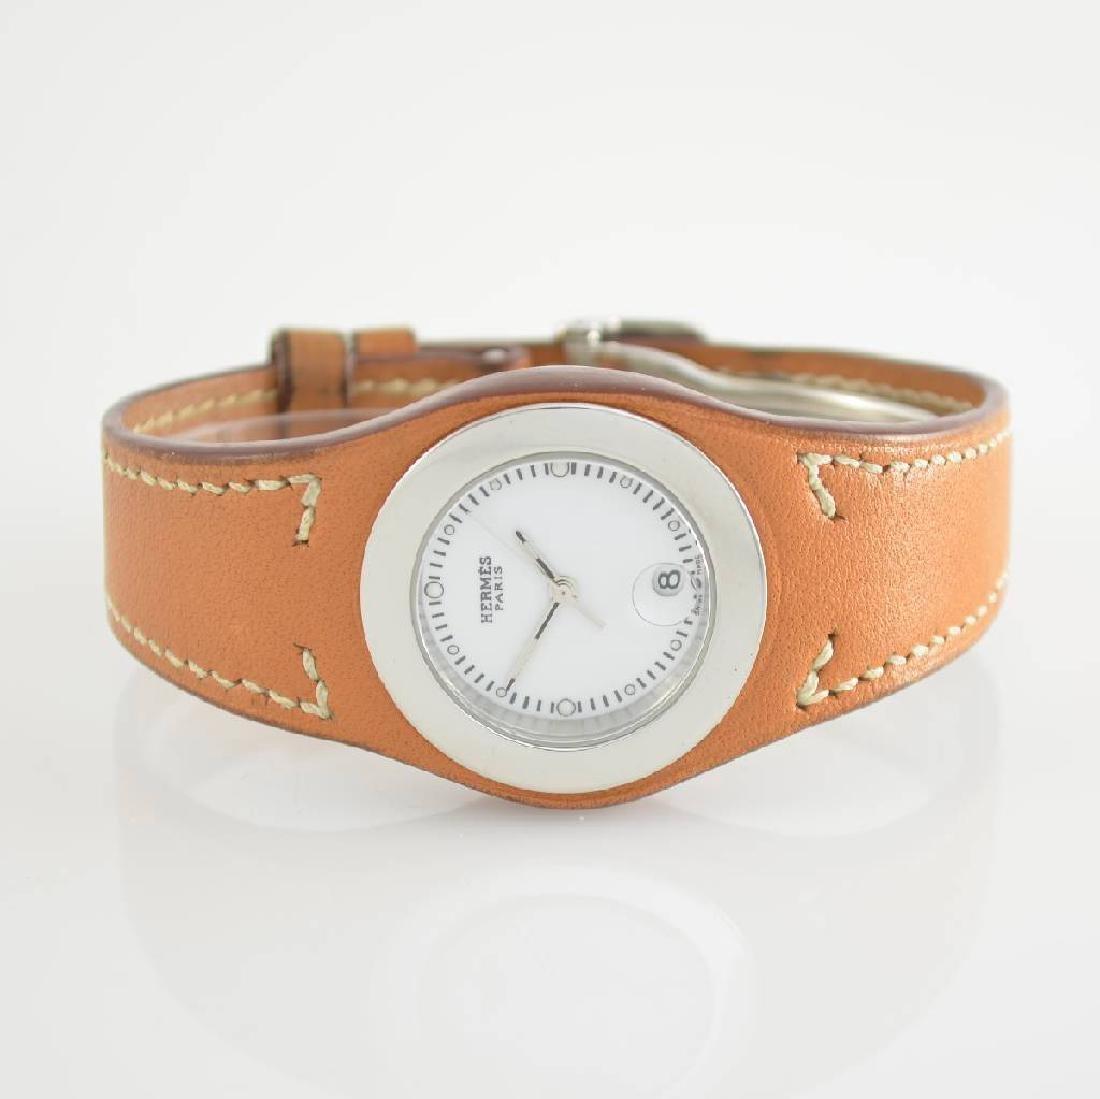 HERMES ladies wristwatch model Harnais